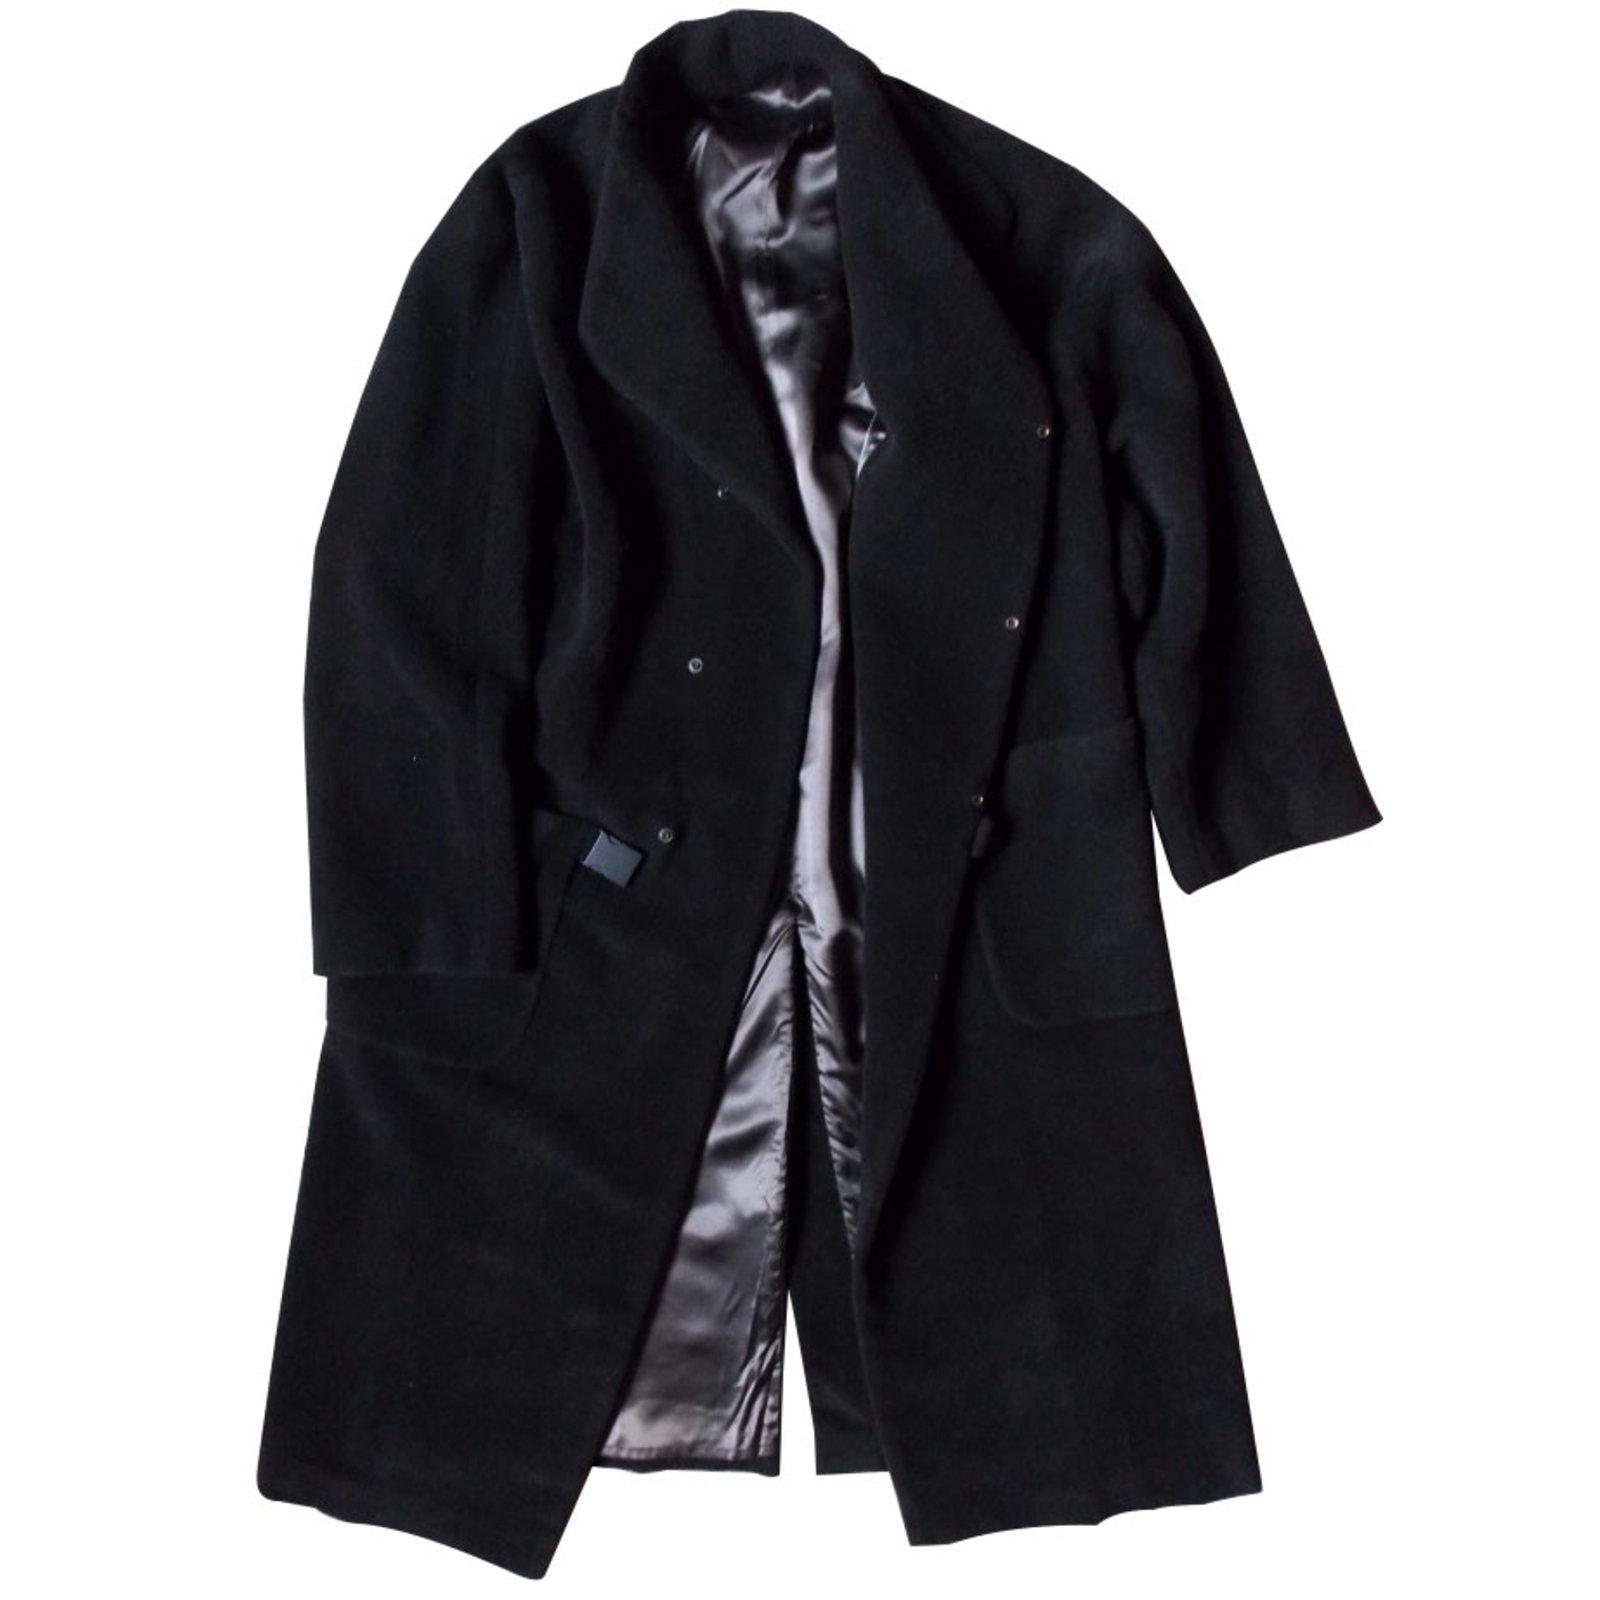 adolfo manteau homme homme adolfo dominguez homme dominguez manteau manteau homme adolfo manteau adolfo dominguez nO0k8wPX